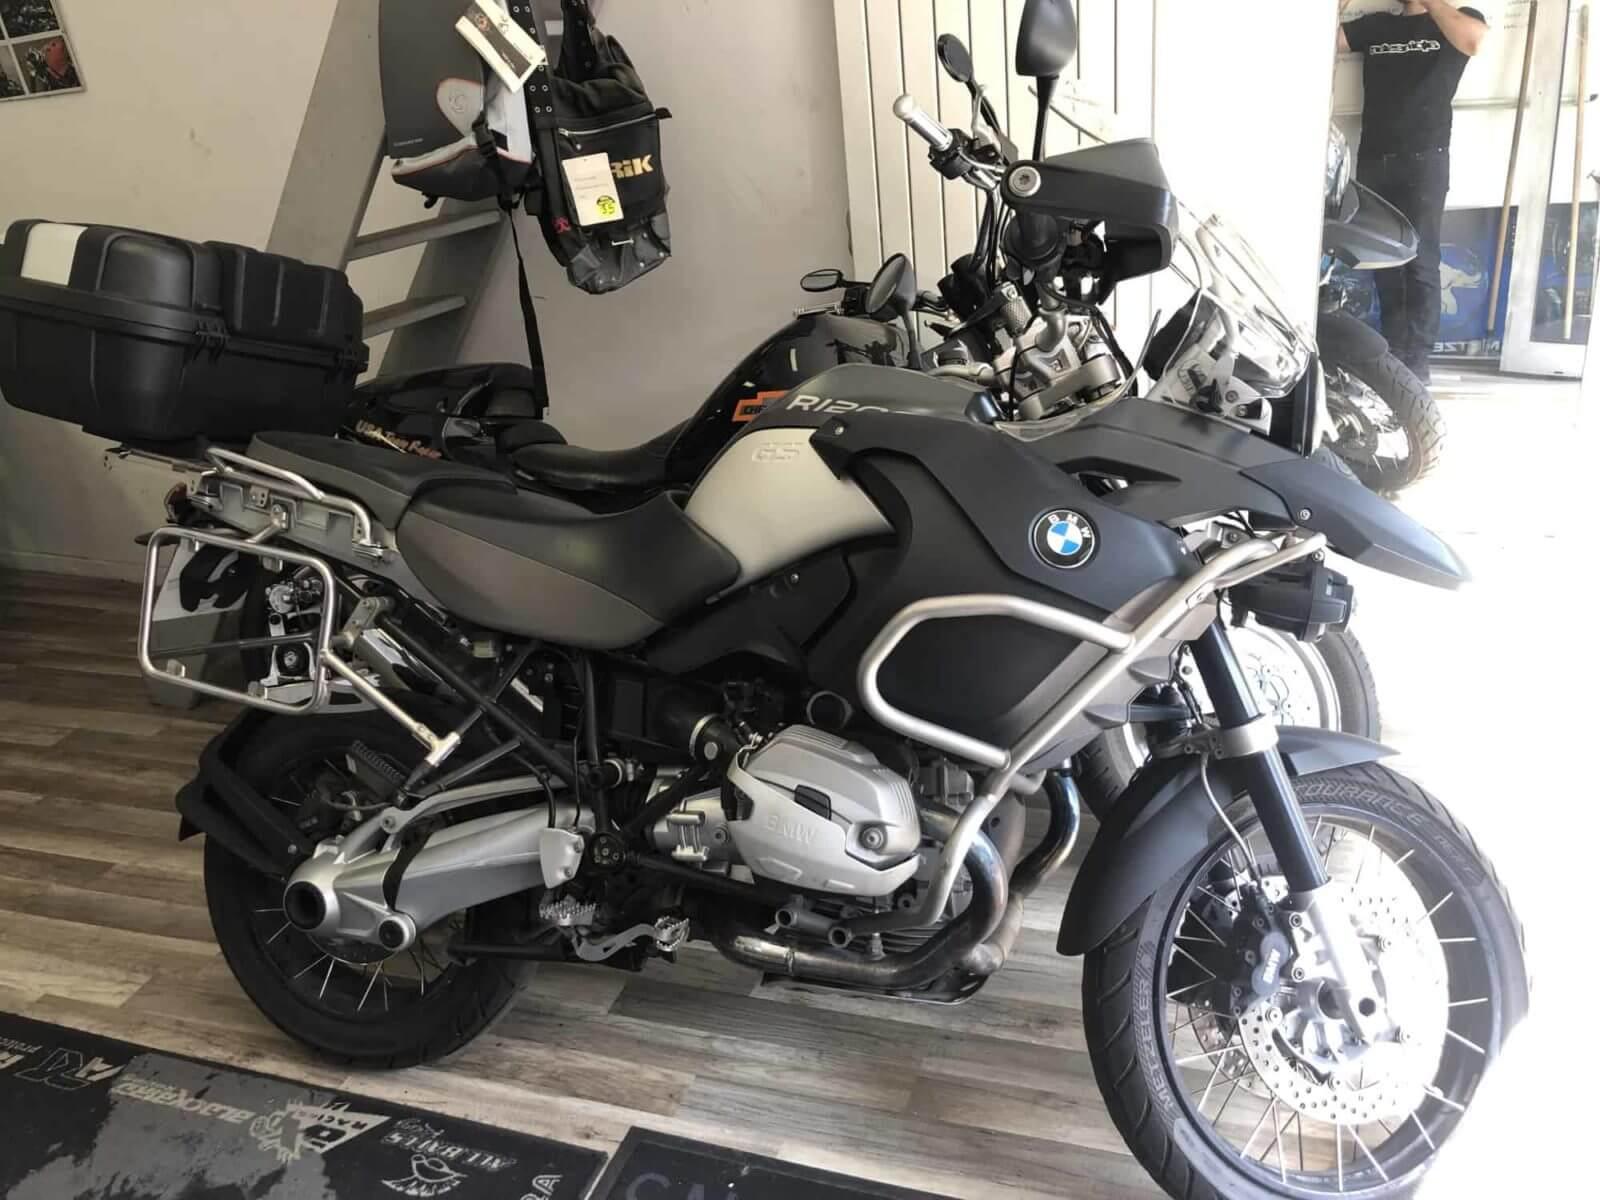 Vendu ! BMW Adventure 1200 – 8600€